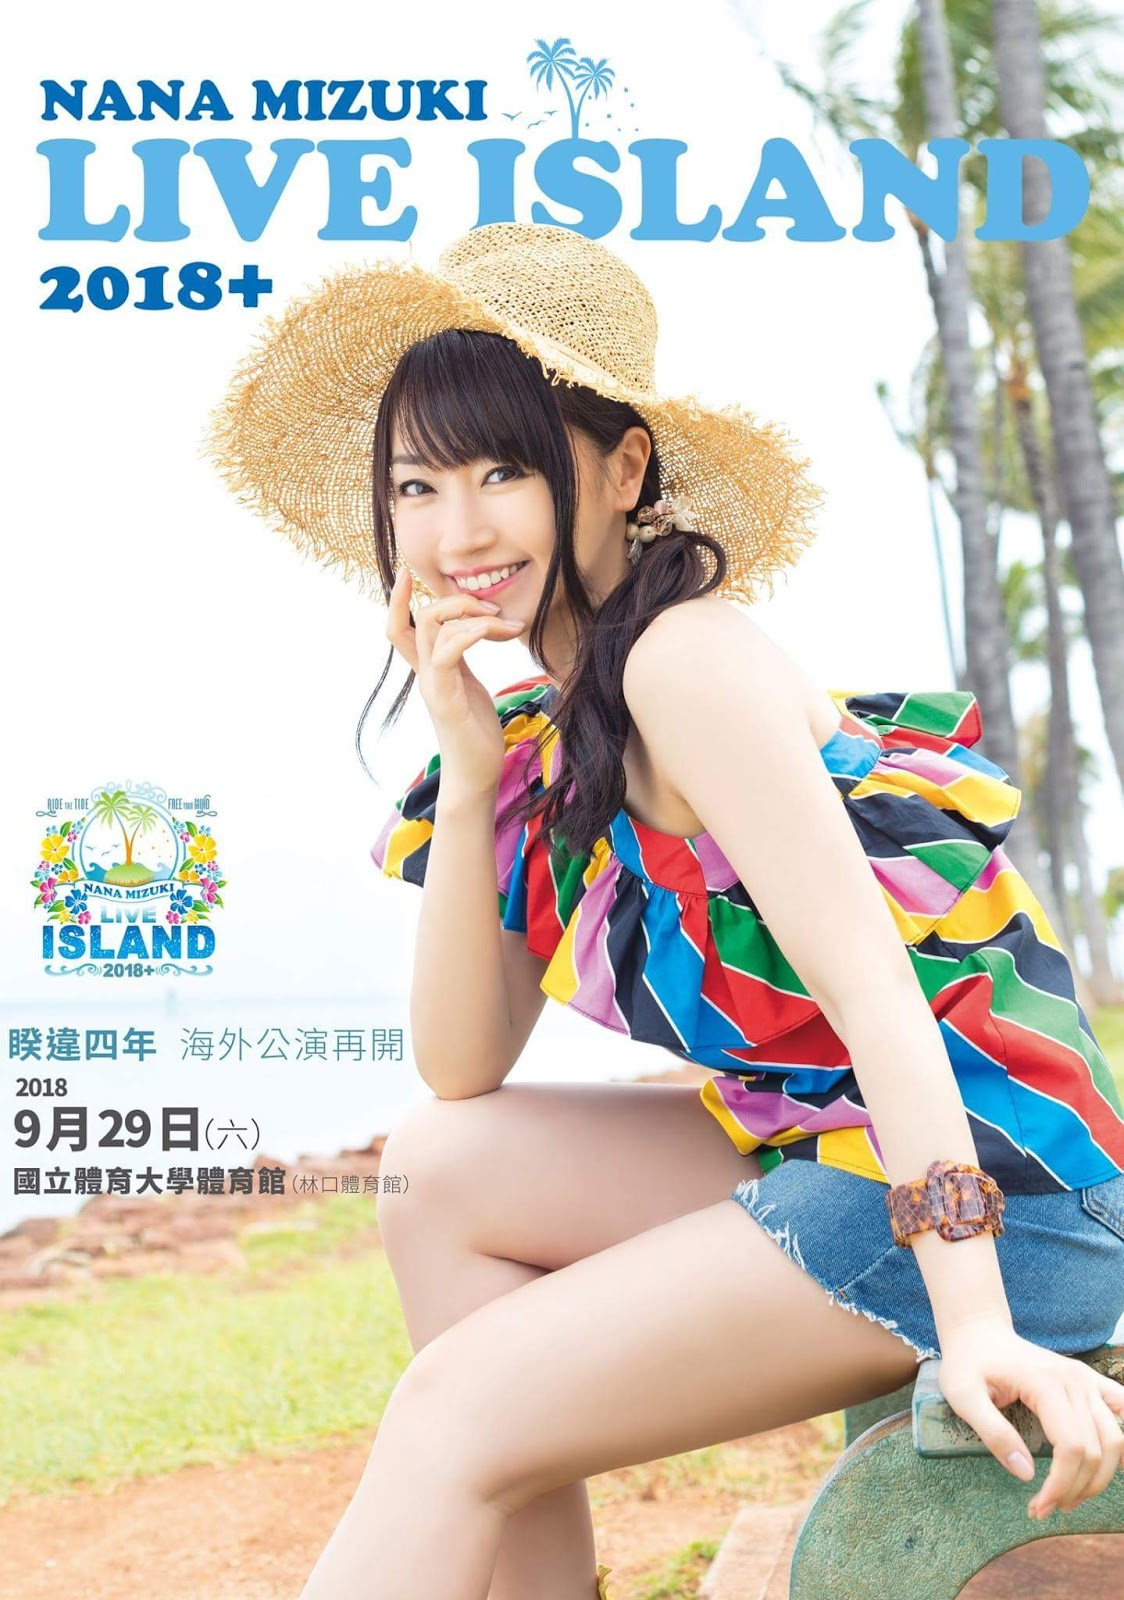 My Somewhere Nana Mizuki Live Island 2018 Wave 01 In Miyagi